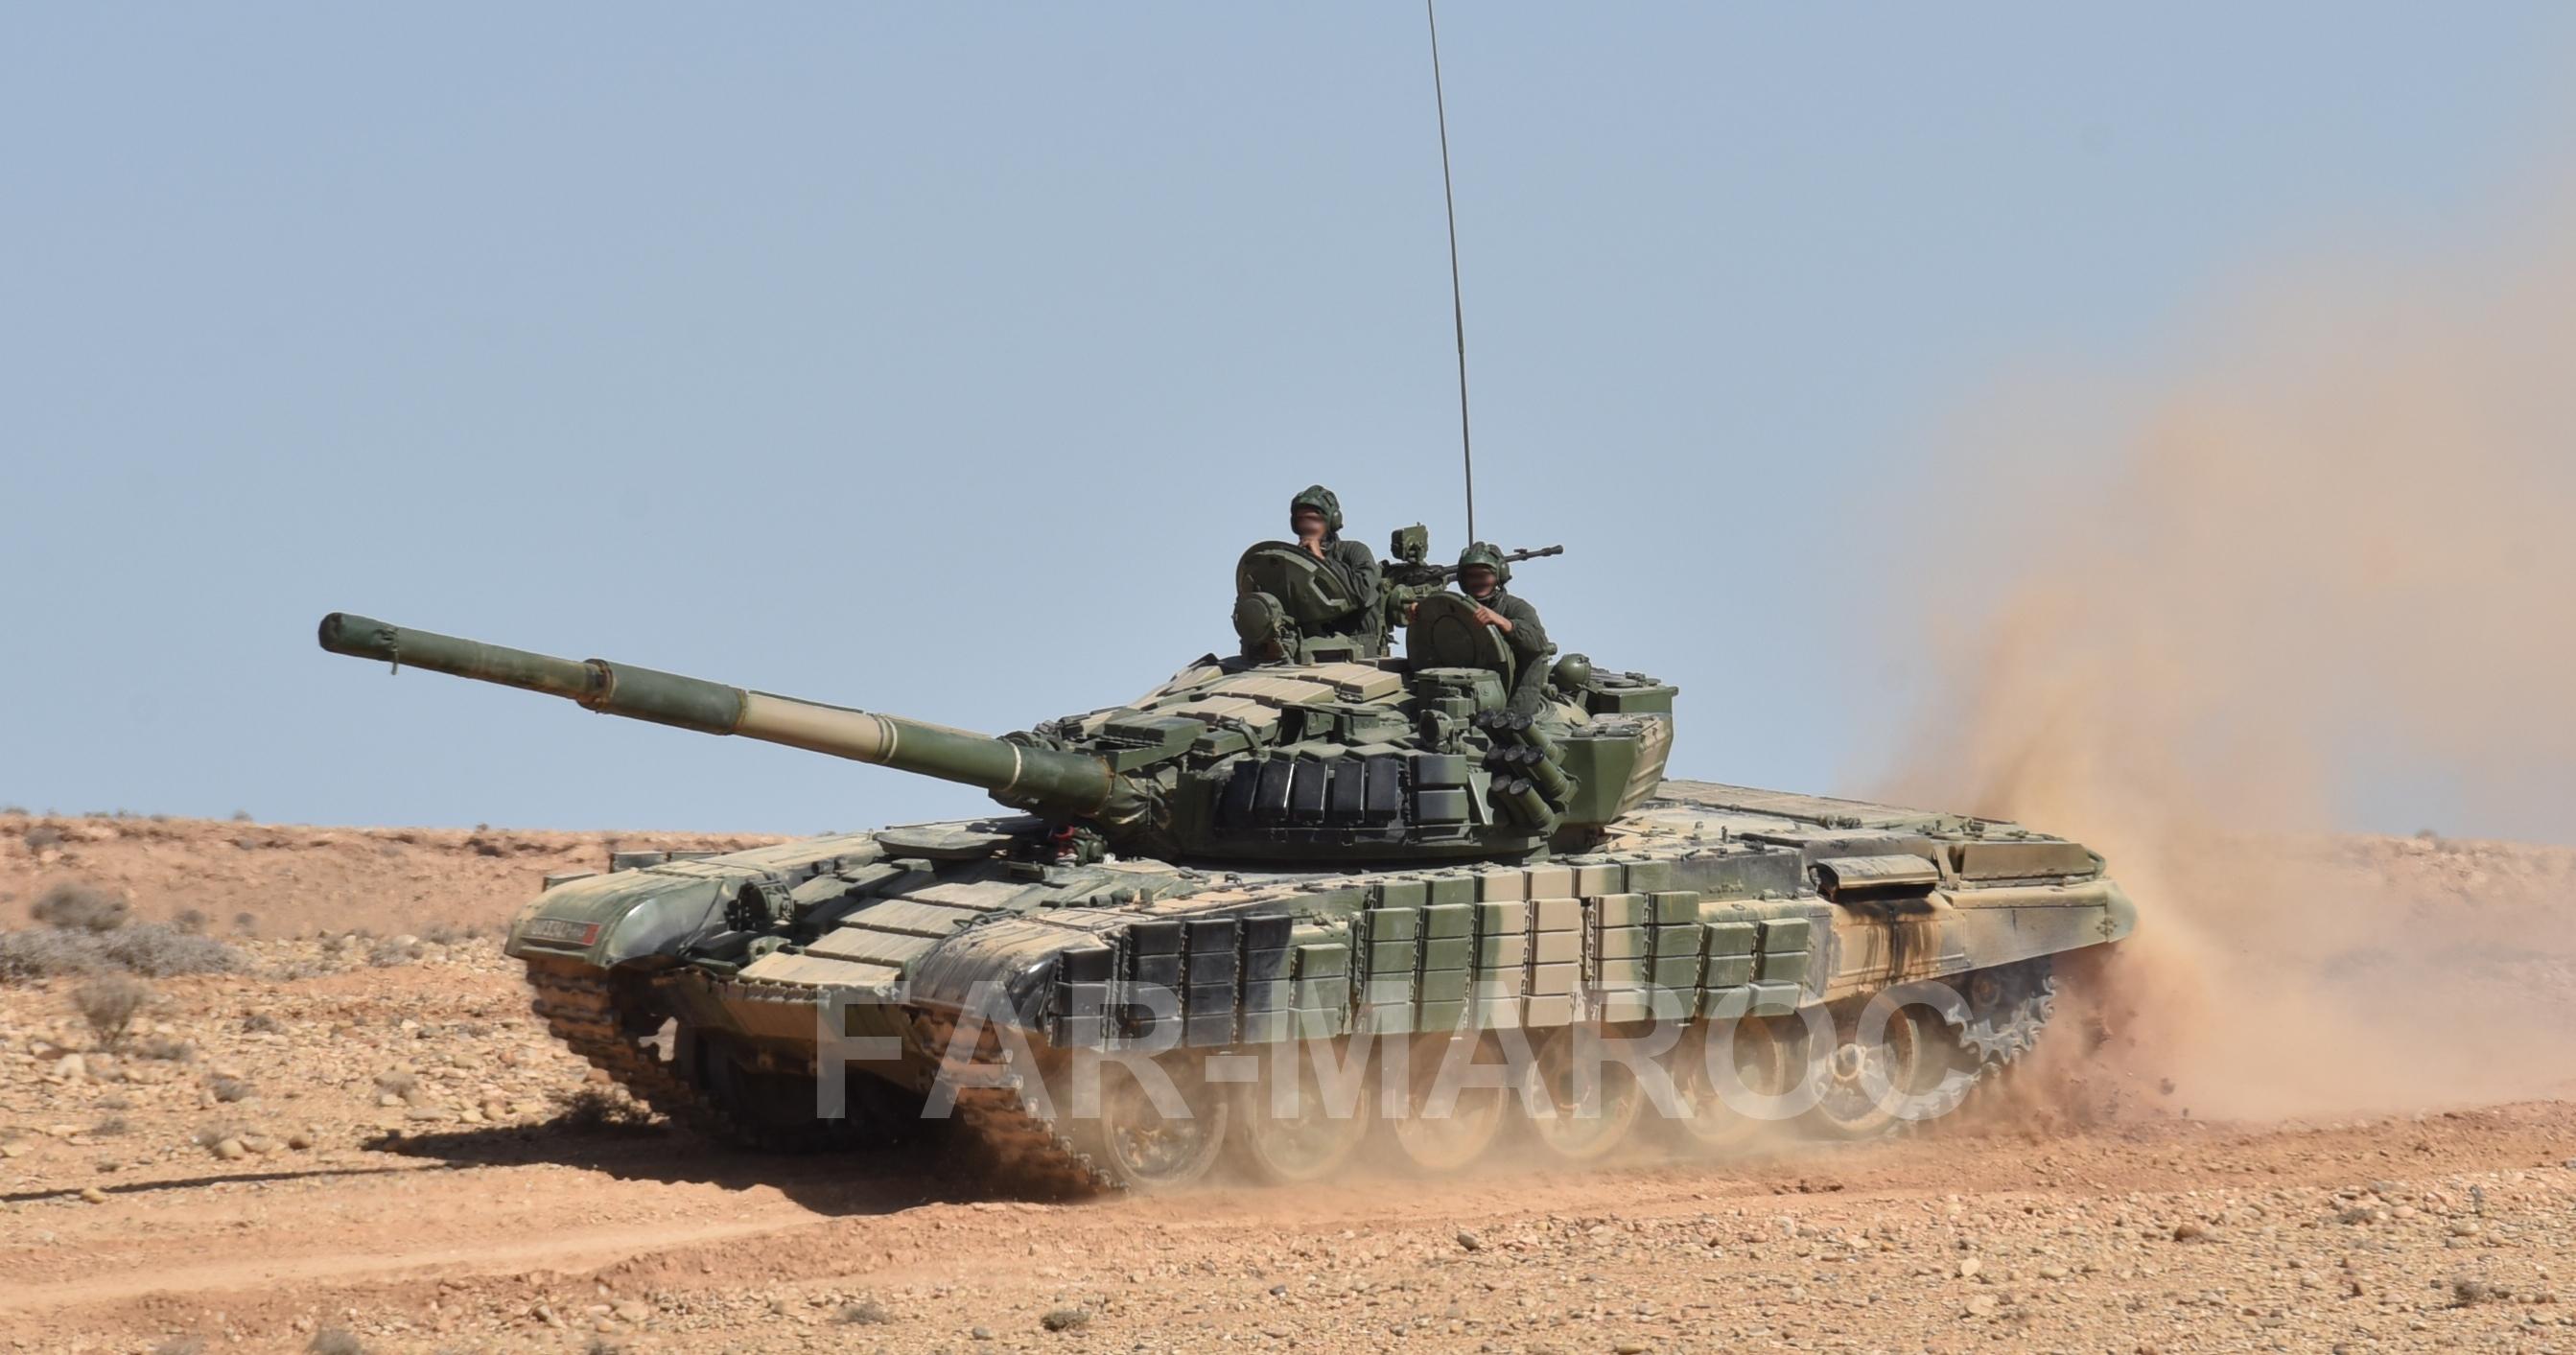 Chars T-72B/BK MArocains // Moroccan Army T-72B/BK Tanks - Page 2 49250468137_cd49d65b19_o